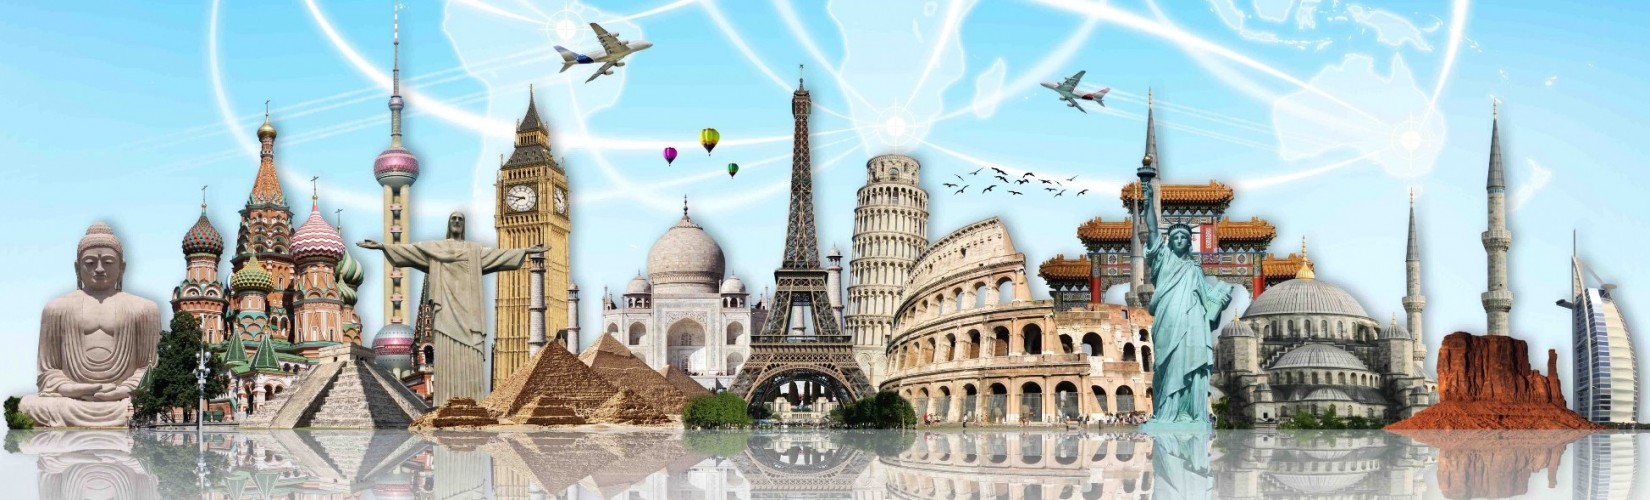 Fly Around The World